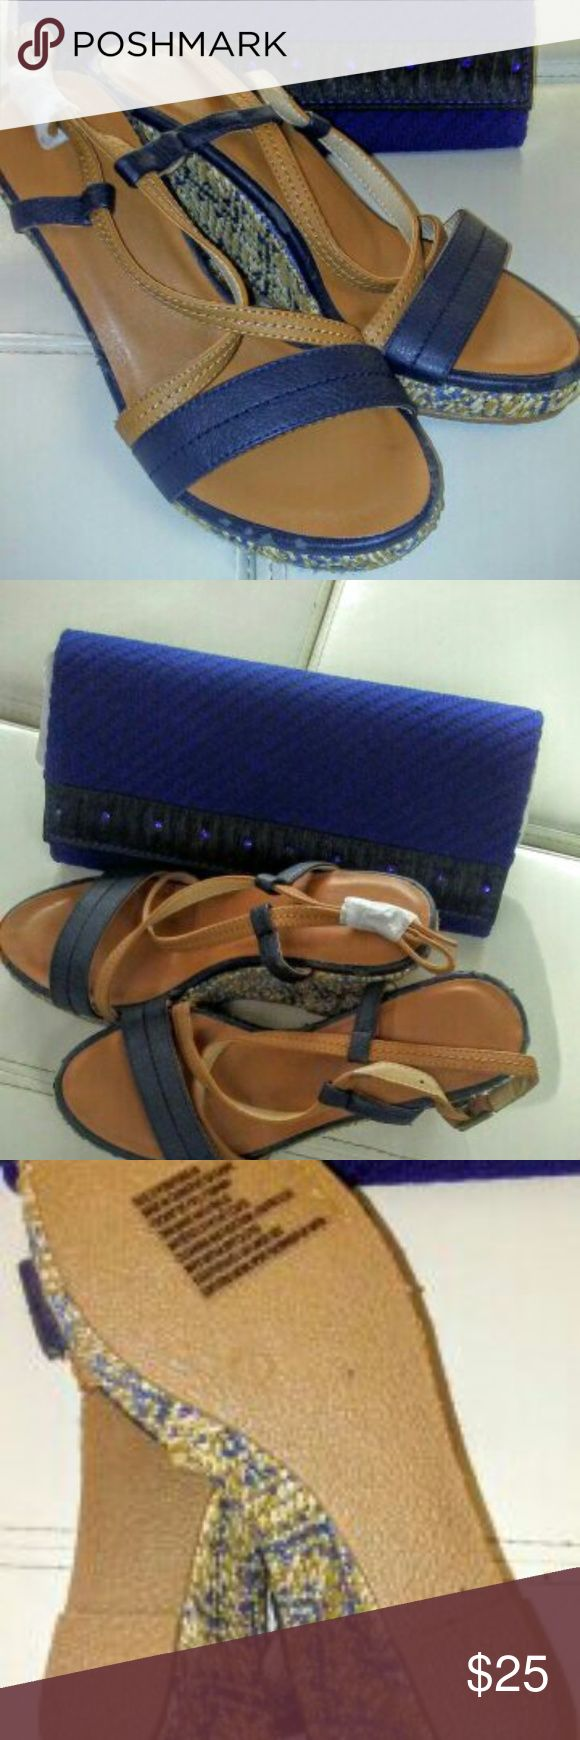 1pr Blue leather stripped peep toe wedge sandals 1pr Blue leather stripped peep toe wedge sandals,3 1/2 heel Shoes Wedges